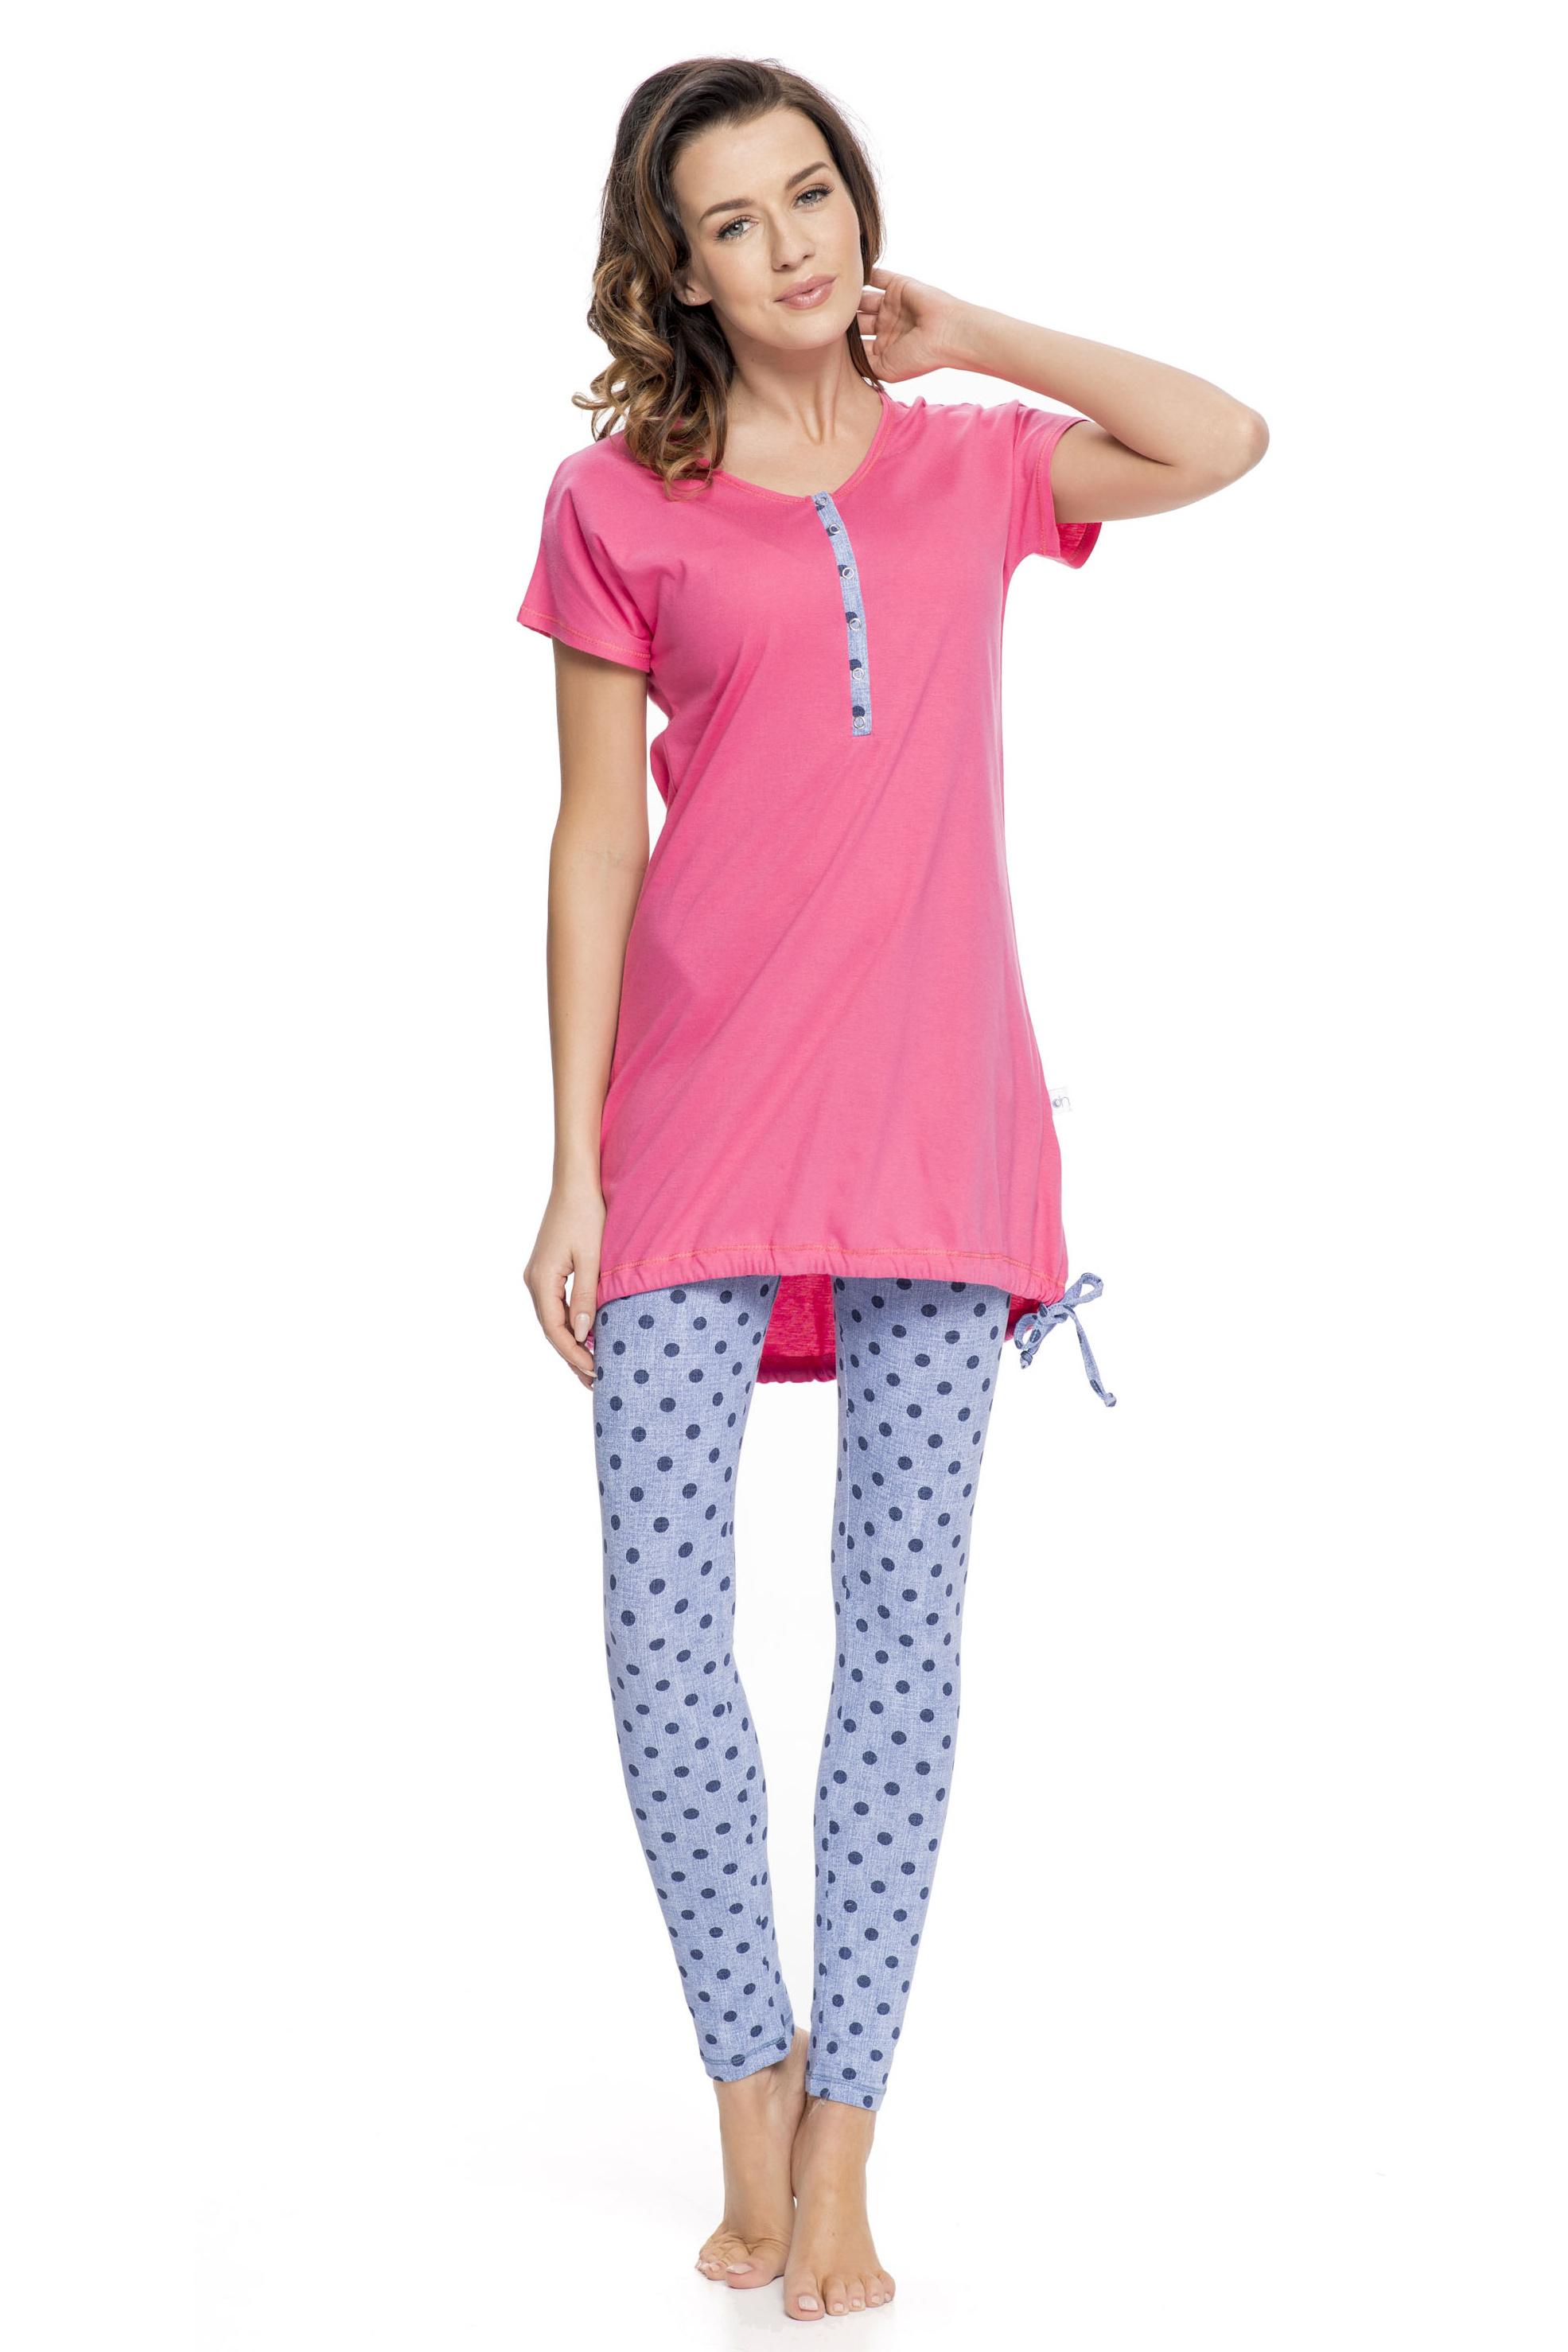 592c1274fe38 Dámské růžové bavlněné pyžamo Alaine s modrými legínami